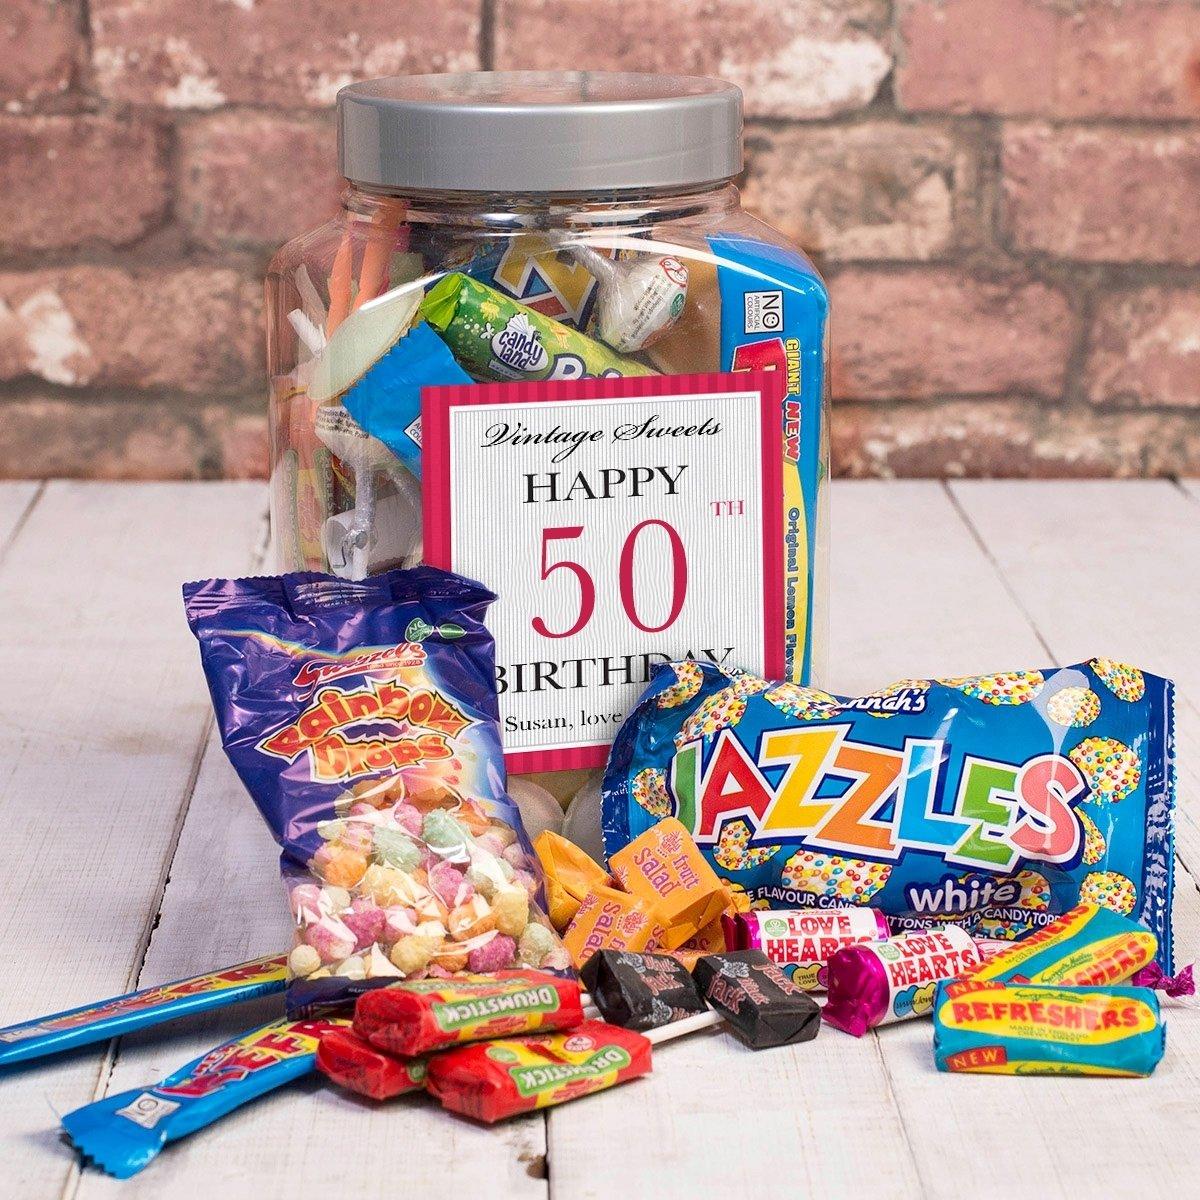 10 Pretty Birthday Gifts Ideas For Her personalised retro sweet jar happy 50th birthday gettingpersonal 6 2021